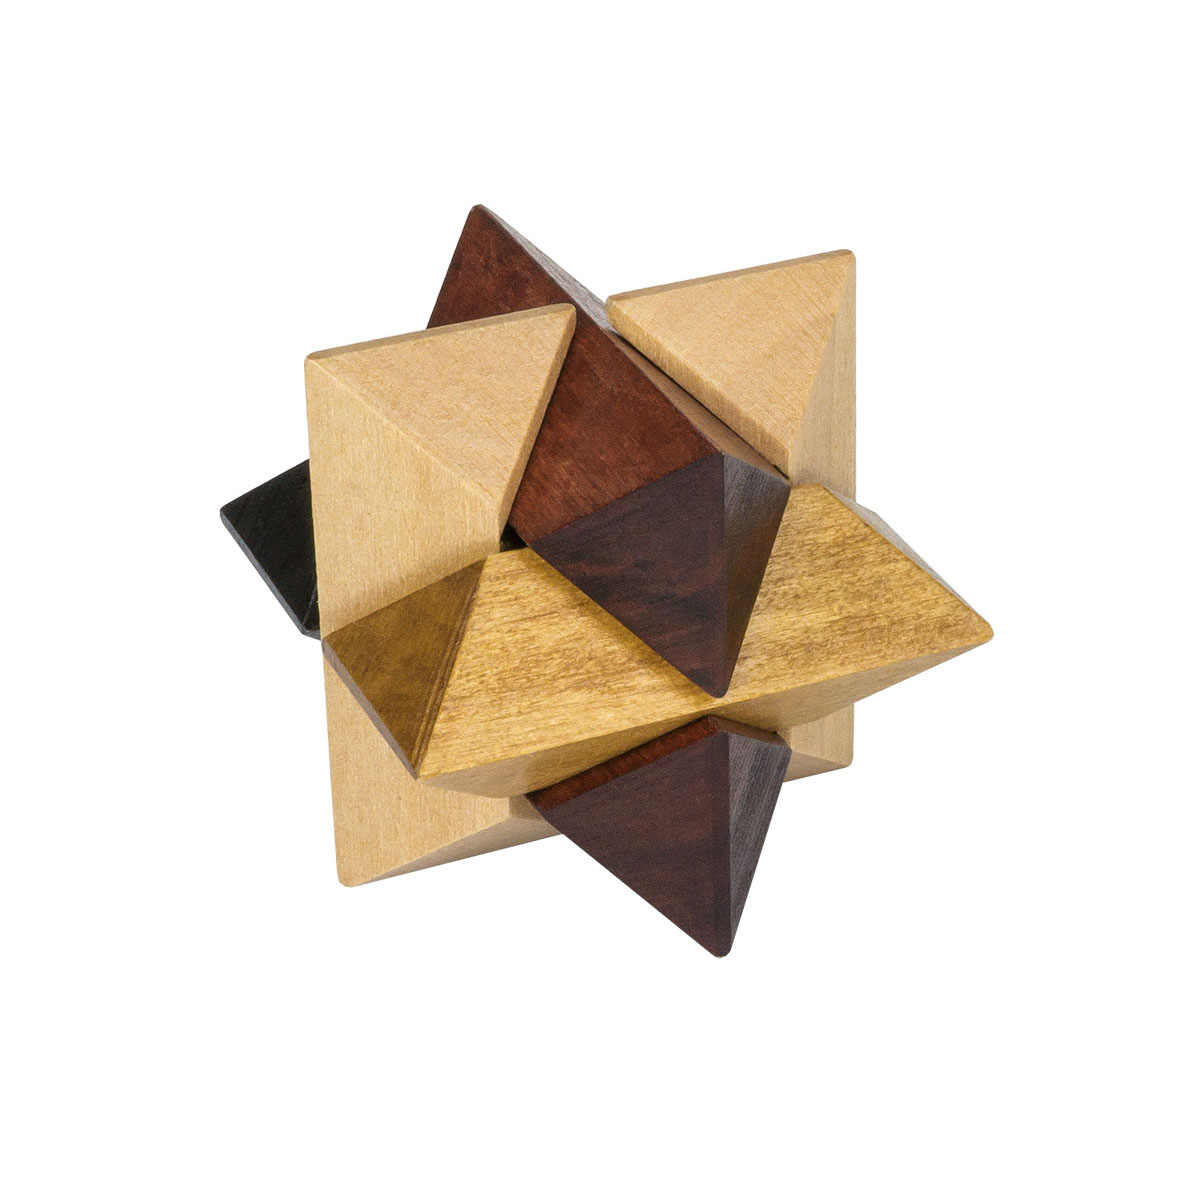 PuzzleAcademyNEW (6 of 7)